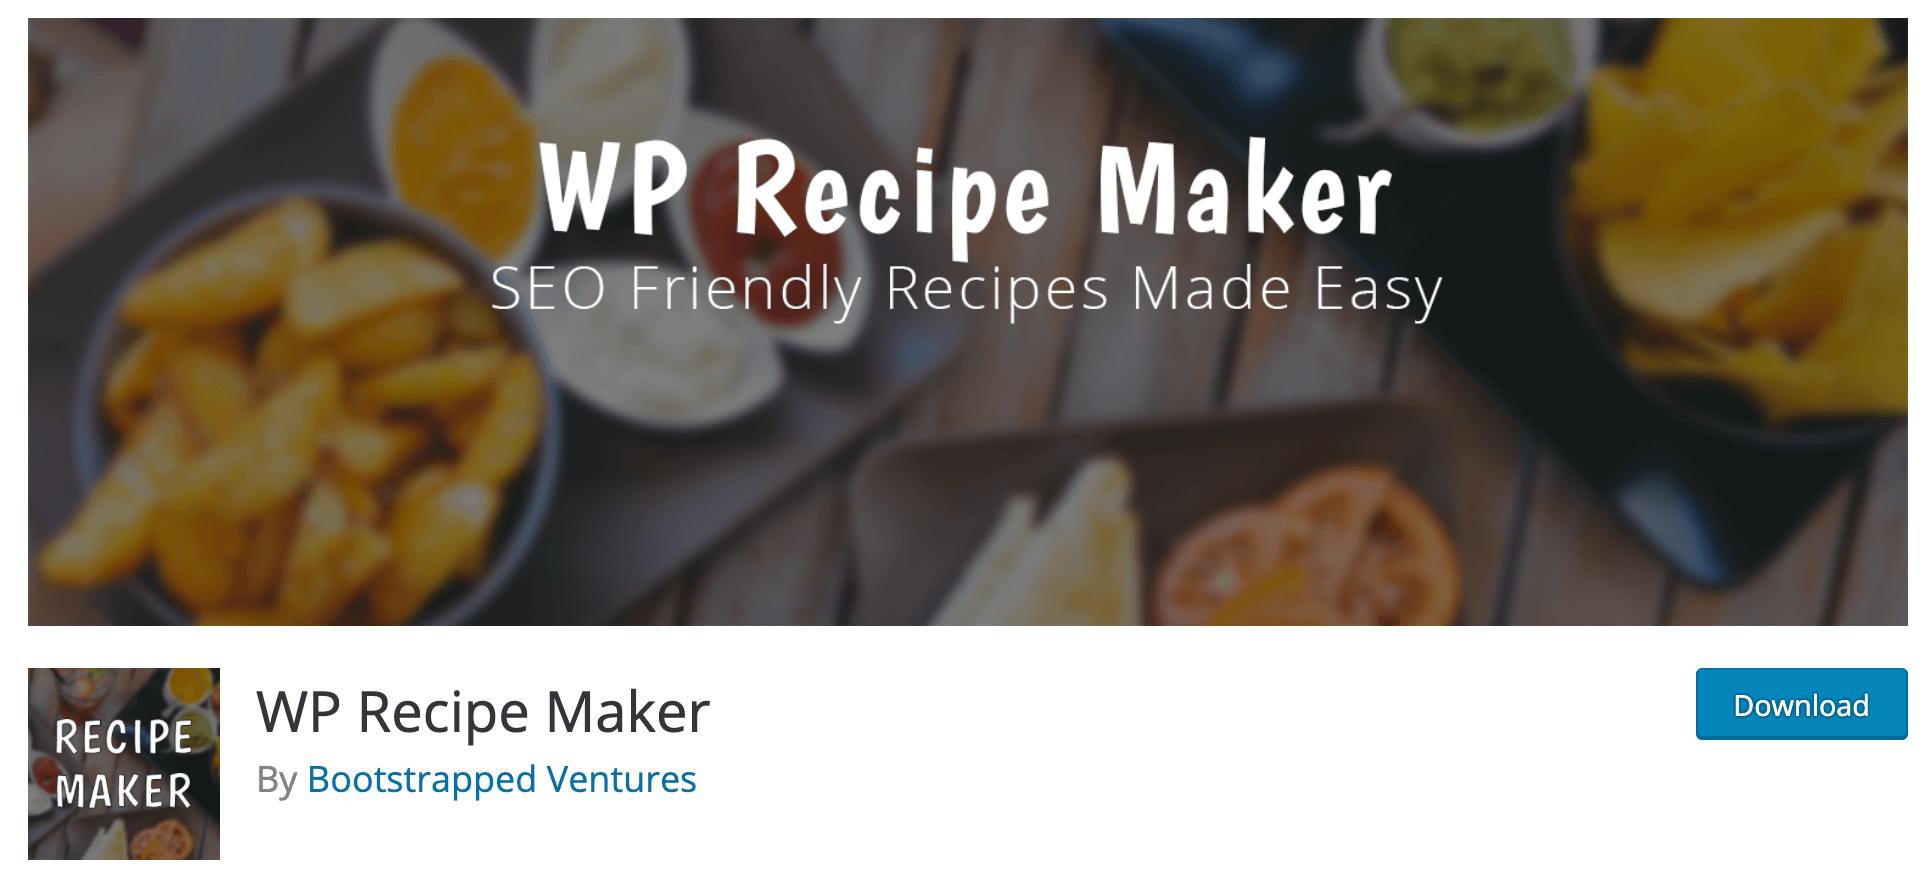 WP Recipe Maker - WordPress recipe plugin